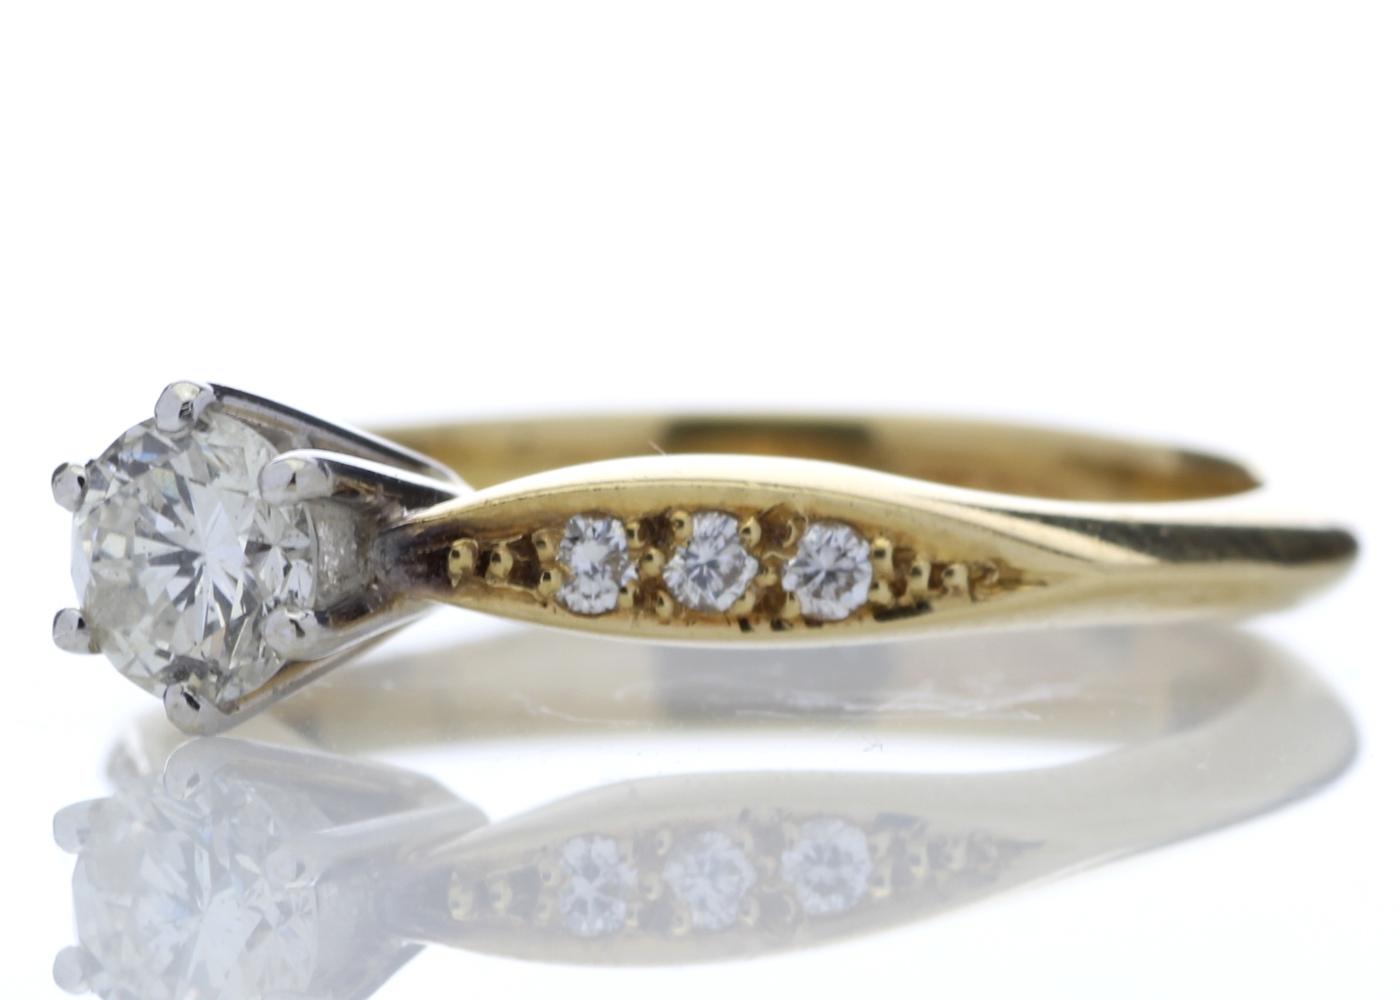 18ct Stone Set Shoulders Diamond Ring 0.42 Carats - Image 2 of 4